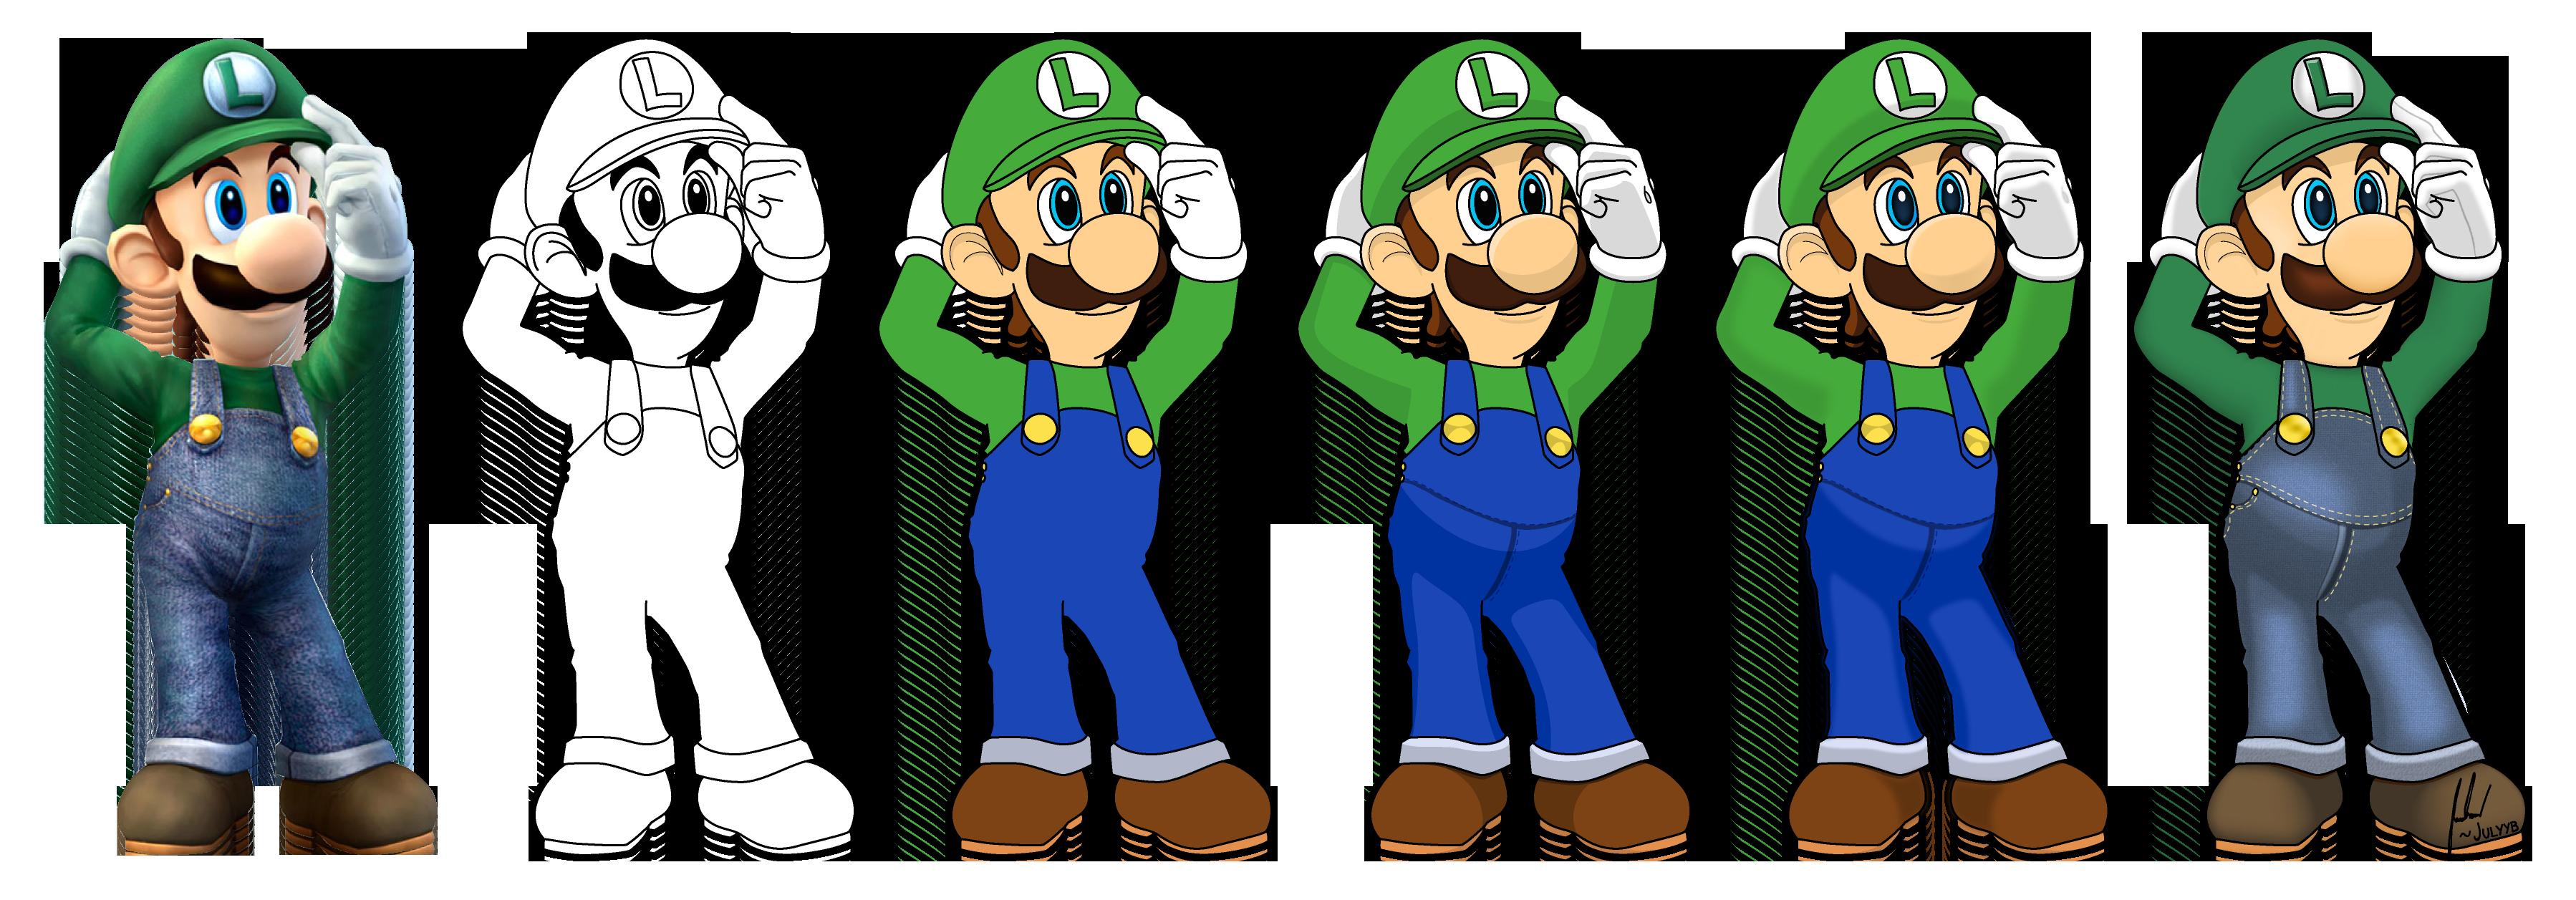 Luigi Vector Drawing by Juliannb4